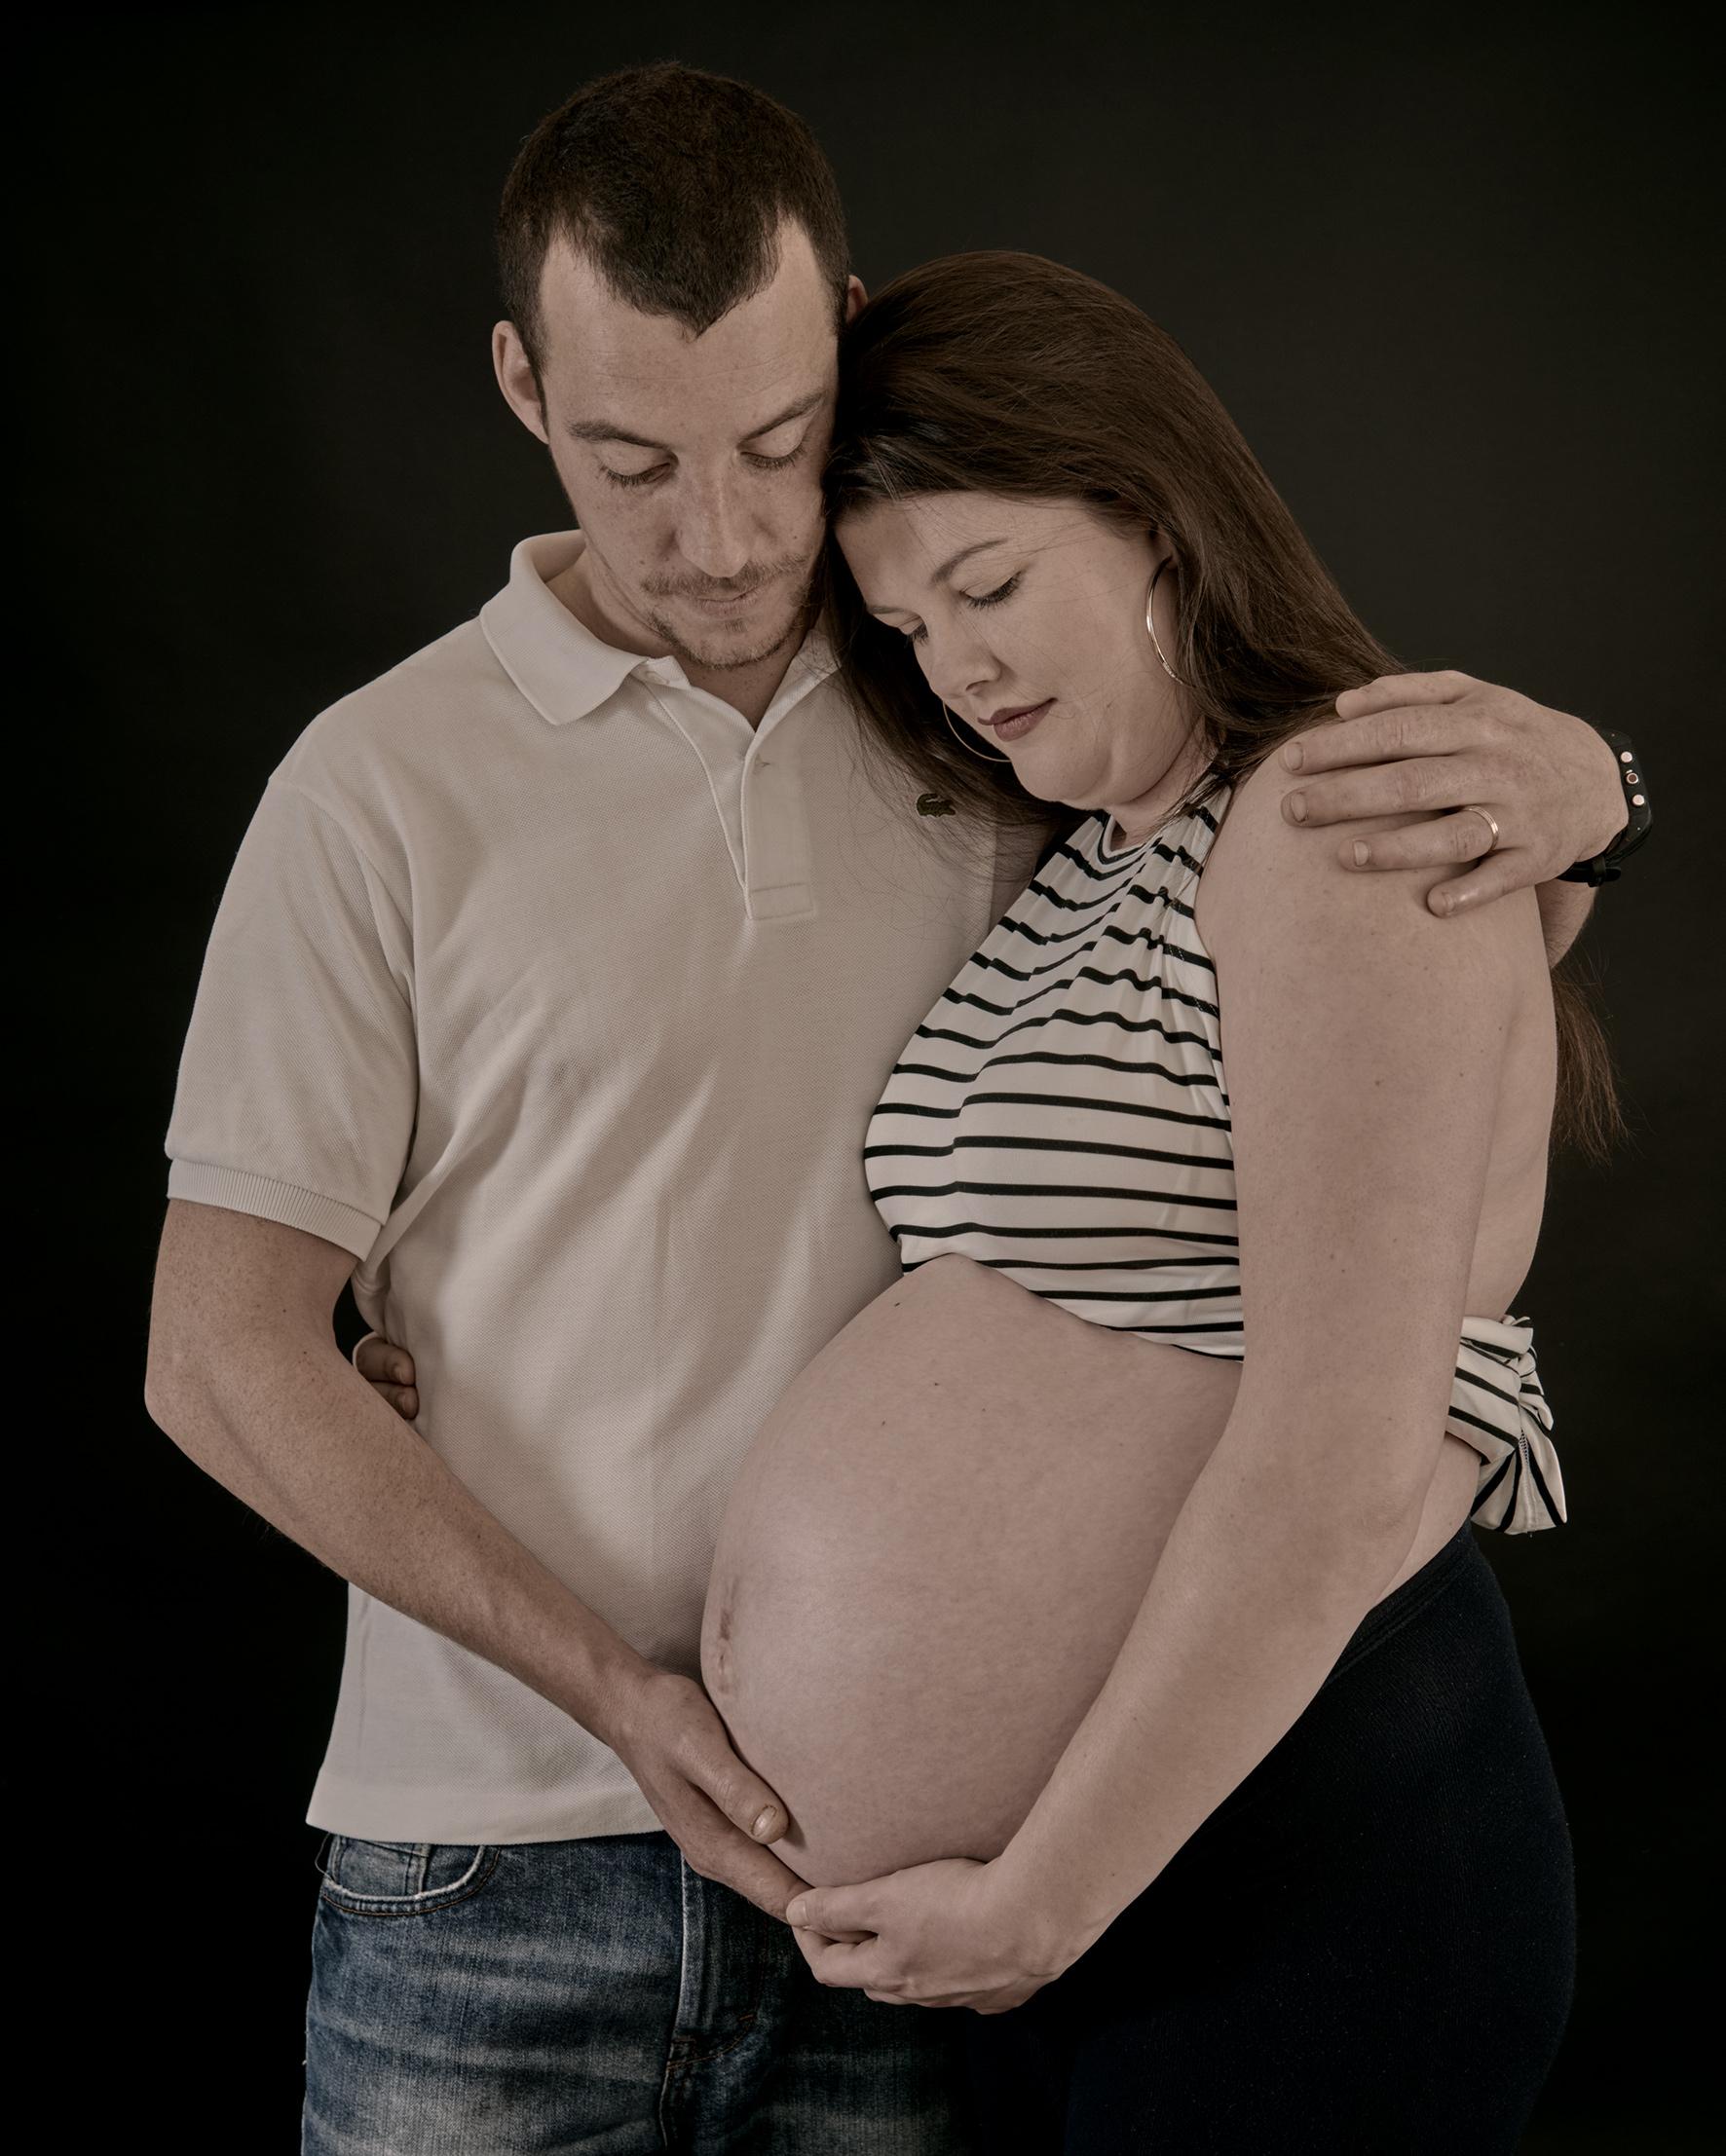 photographe-grossesse-saint-brieuc